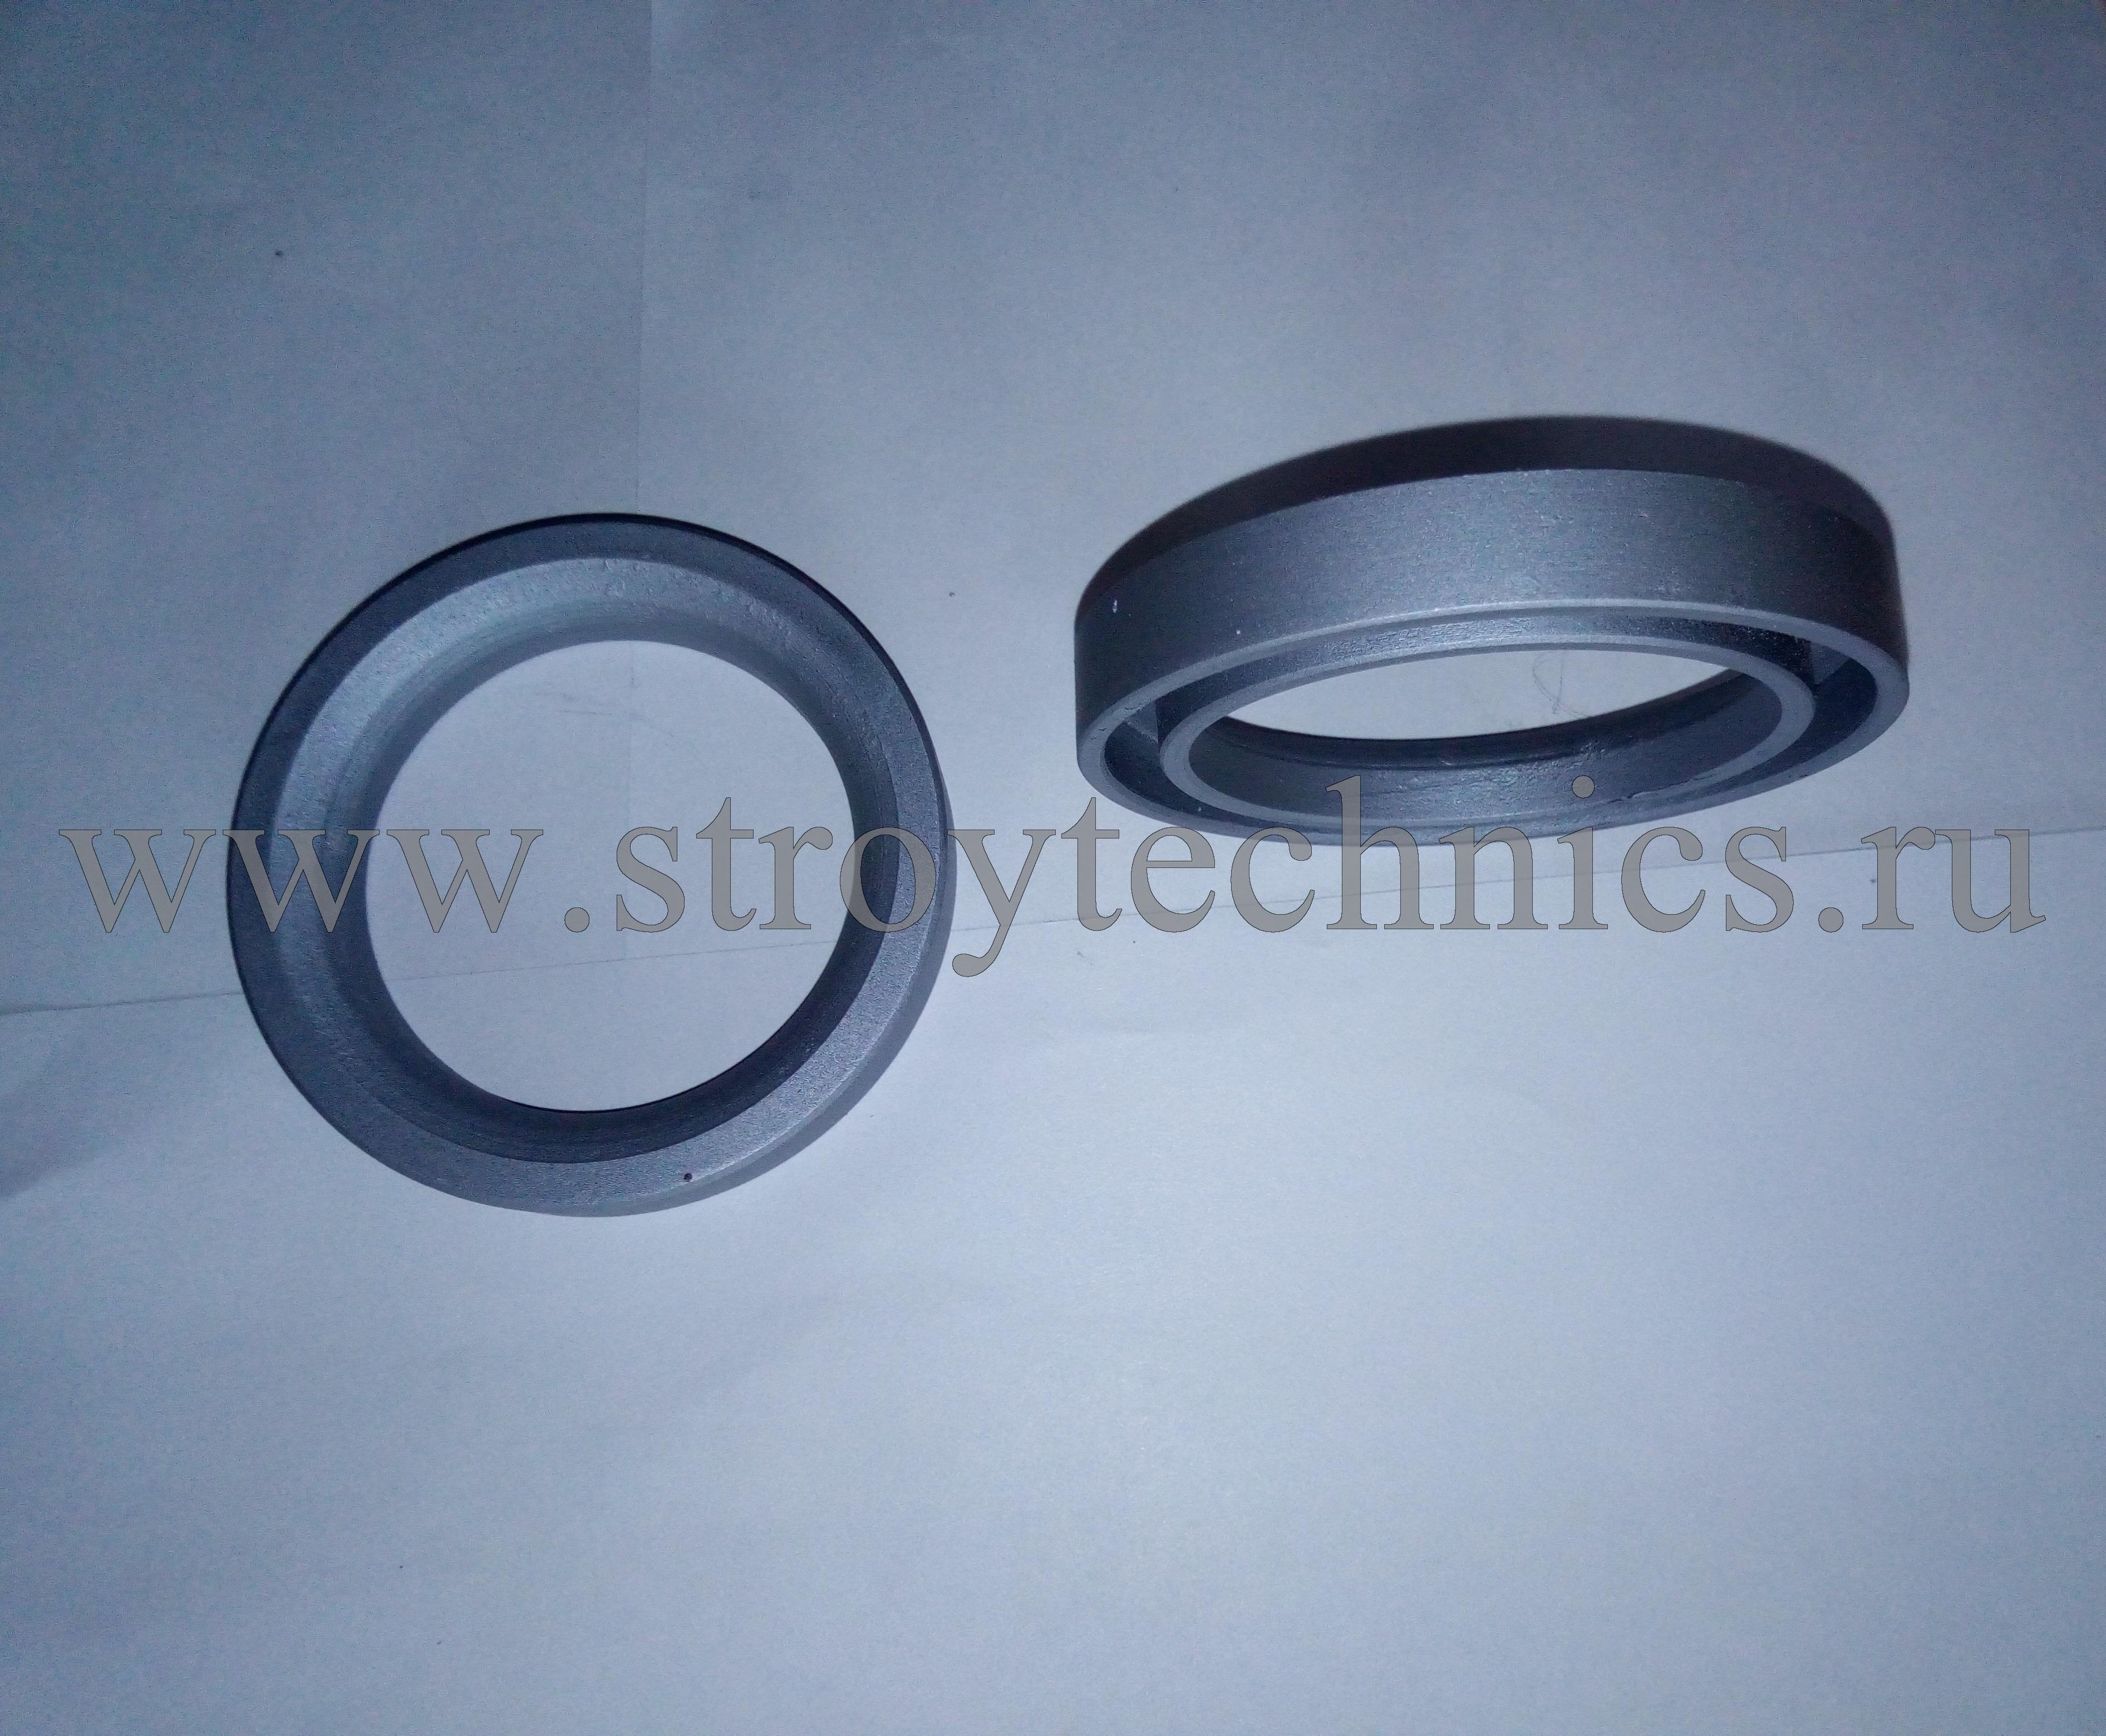 Кольцо лабиринтовое оси балансира опорного катка (47-3203007)